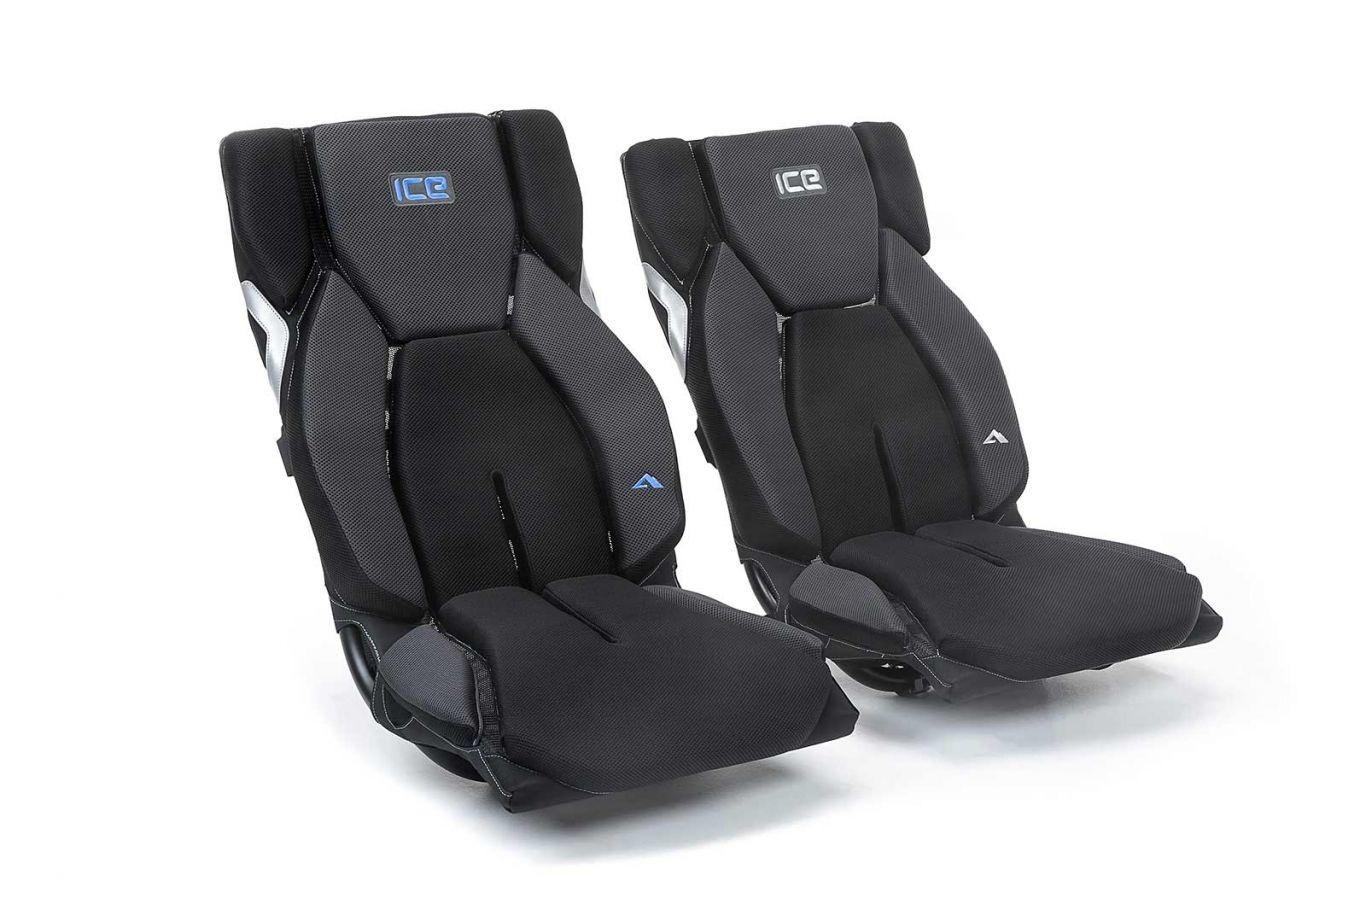 ICE Seats